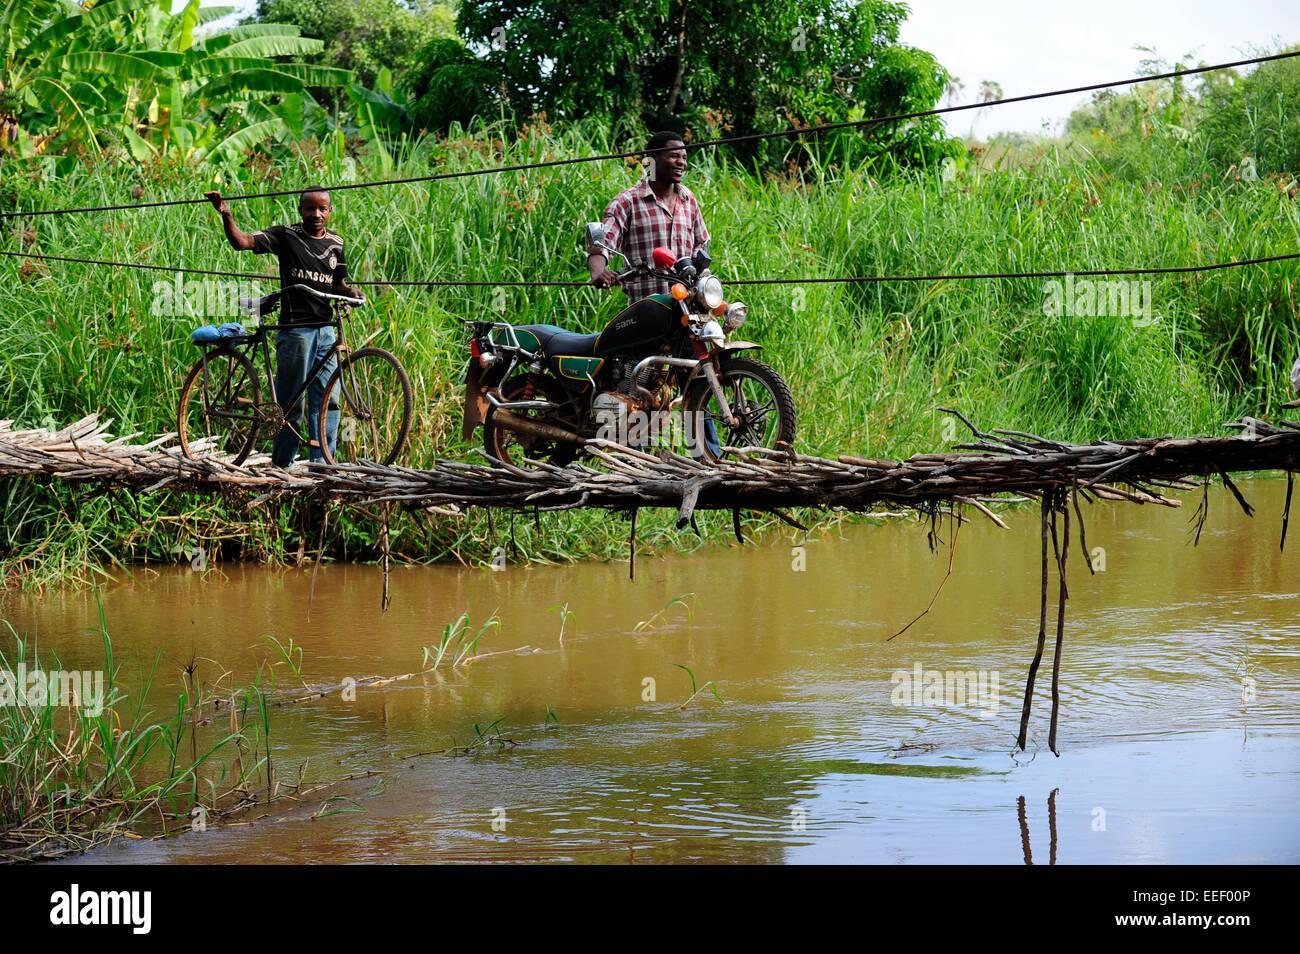 TANZANIA, Korogwe, hanging bridge in Kwalukonge / TANSANIA, Korogwe, Haengebruecke in Kwalukonge - Stock Image